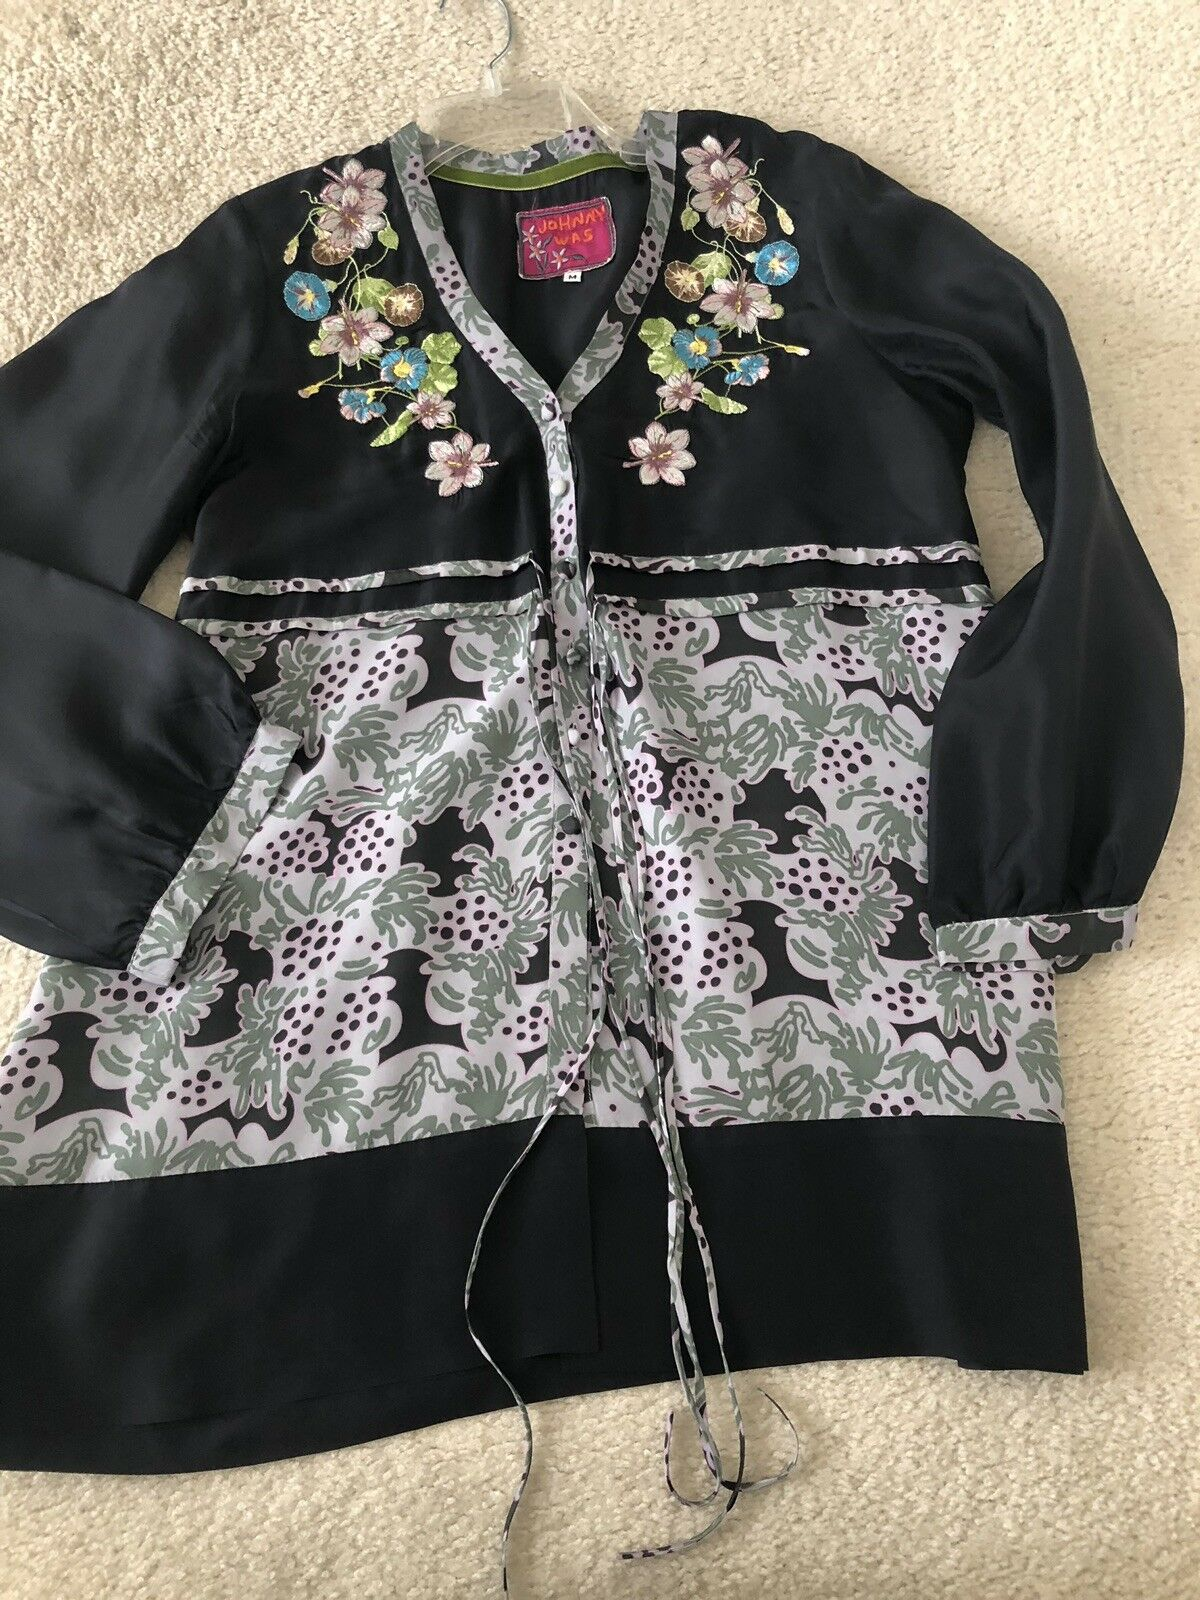 Johnny Was Mixed Print Embroiderot Tunic Top Medium Embroiderot Biya Jwla Silk